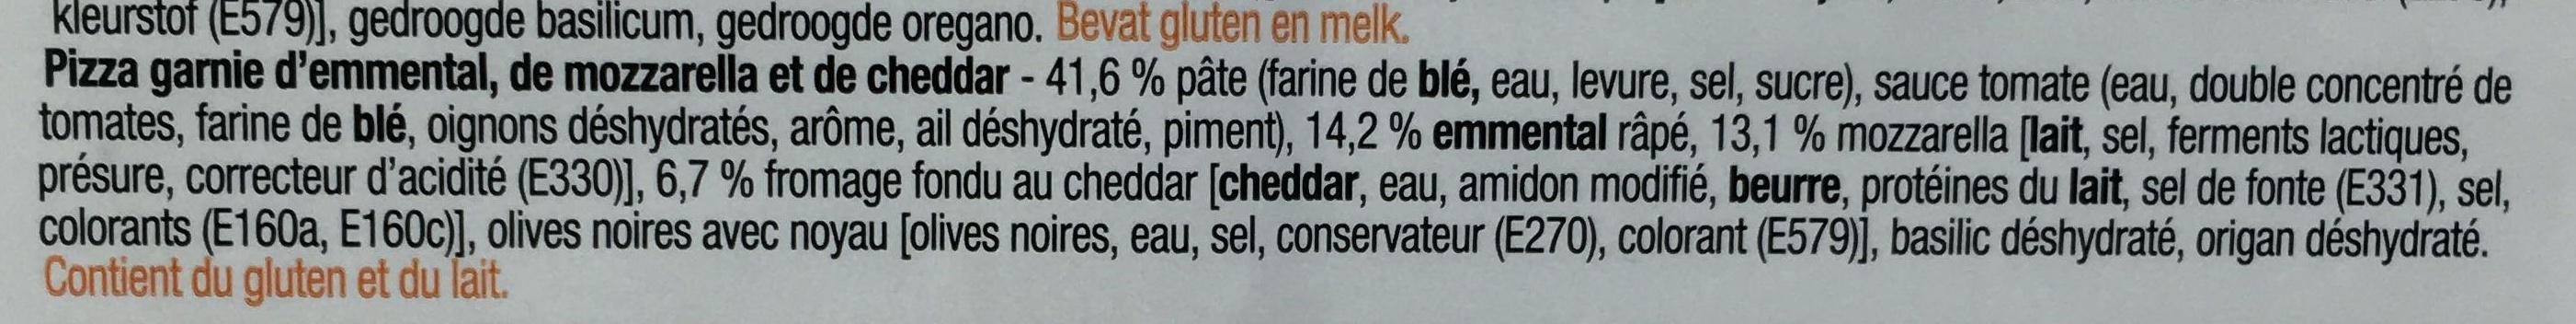 3 formaggi Emmental, Mozzarella, Cheddar - Ingrediënten - fr